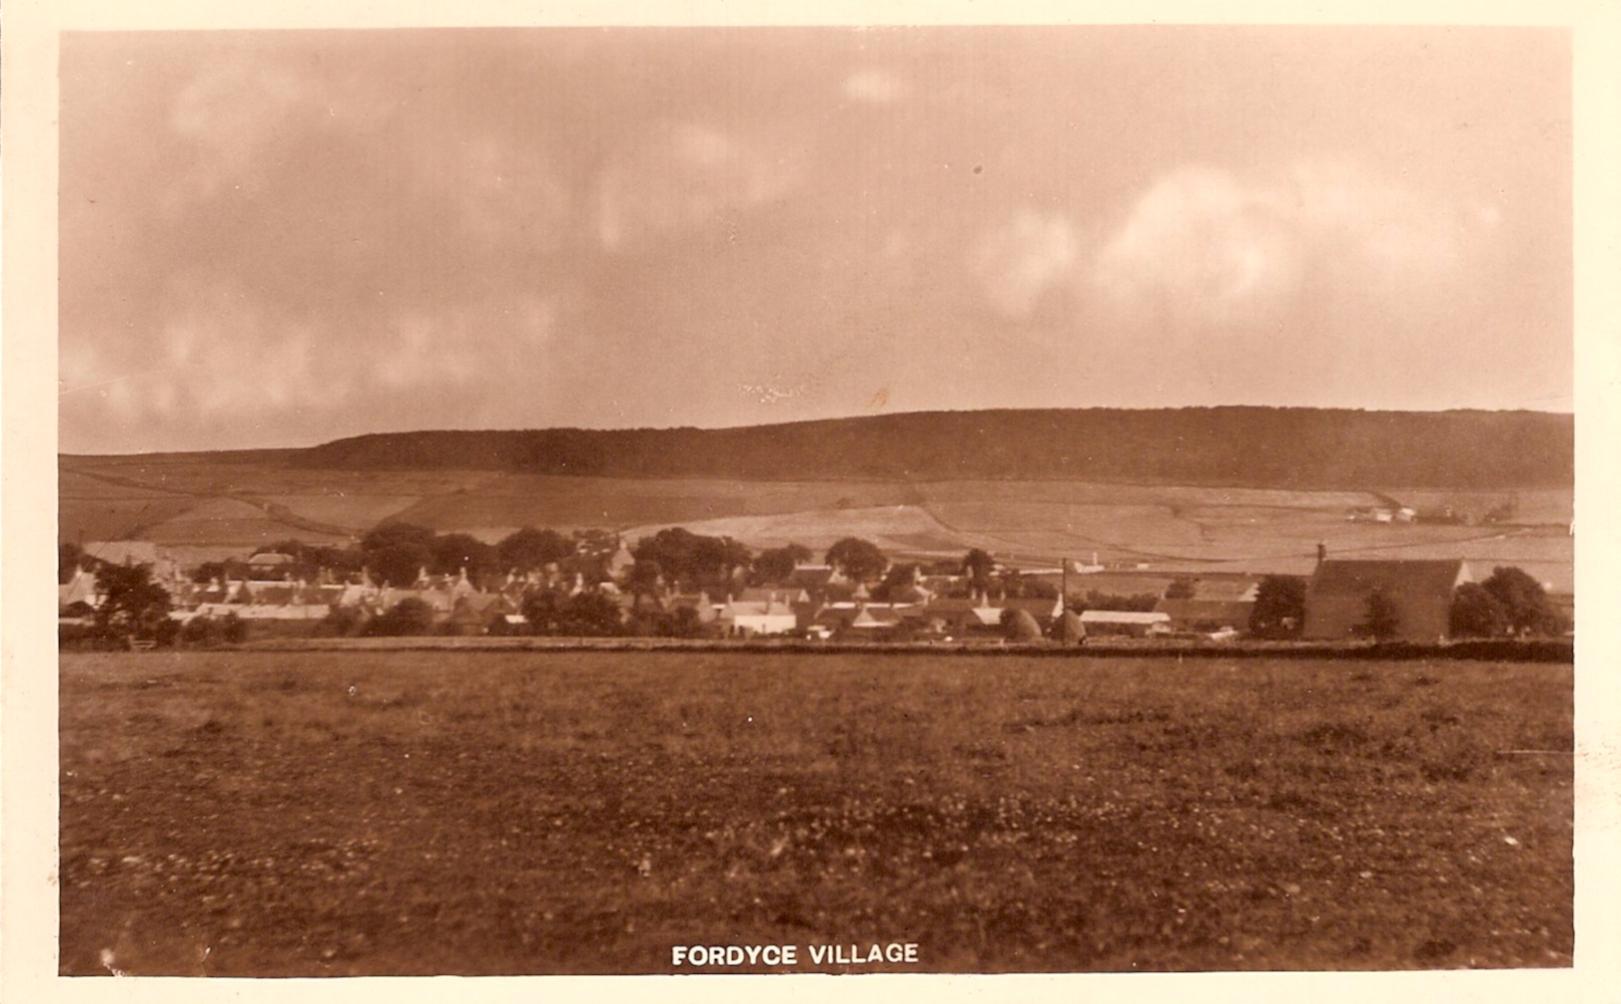 Fordyce Village